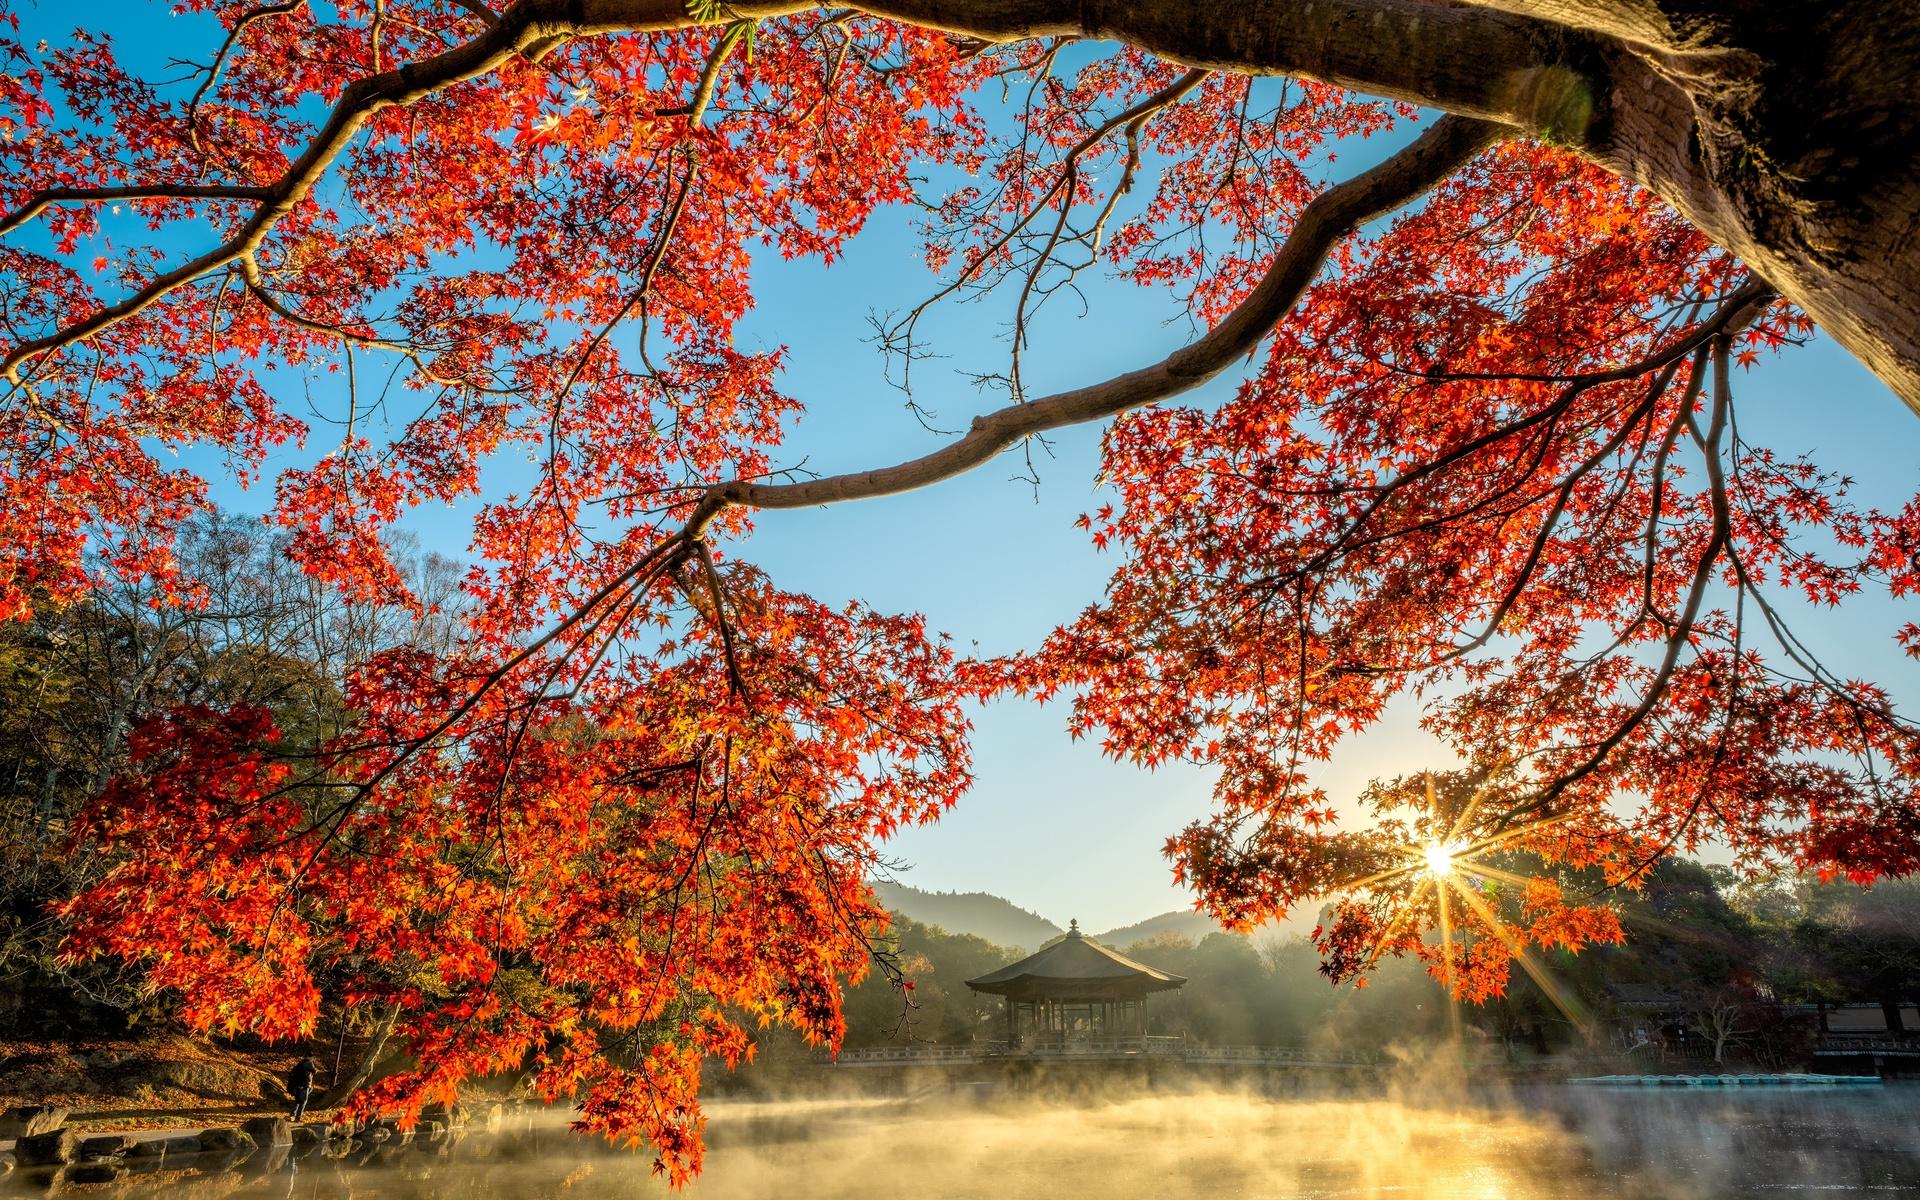 осень, пруд, пагоды, ветки, лучи света, туман, клён, природа